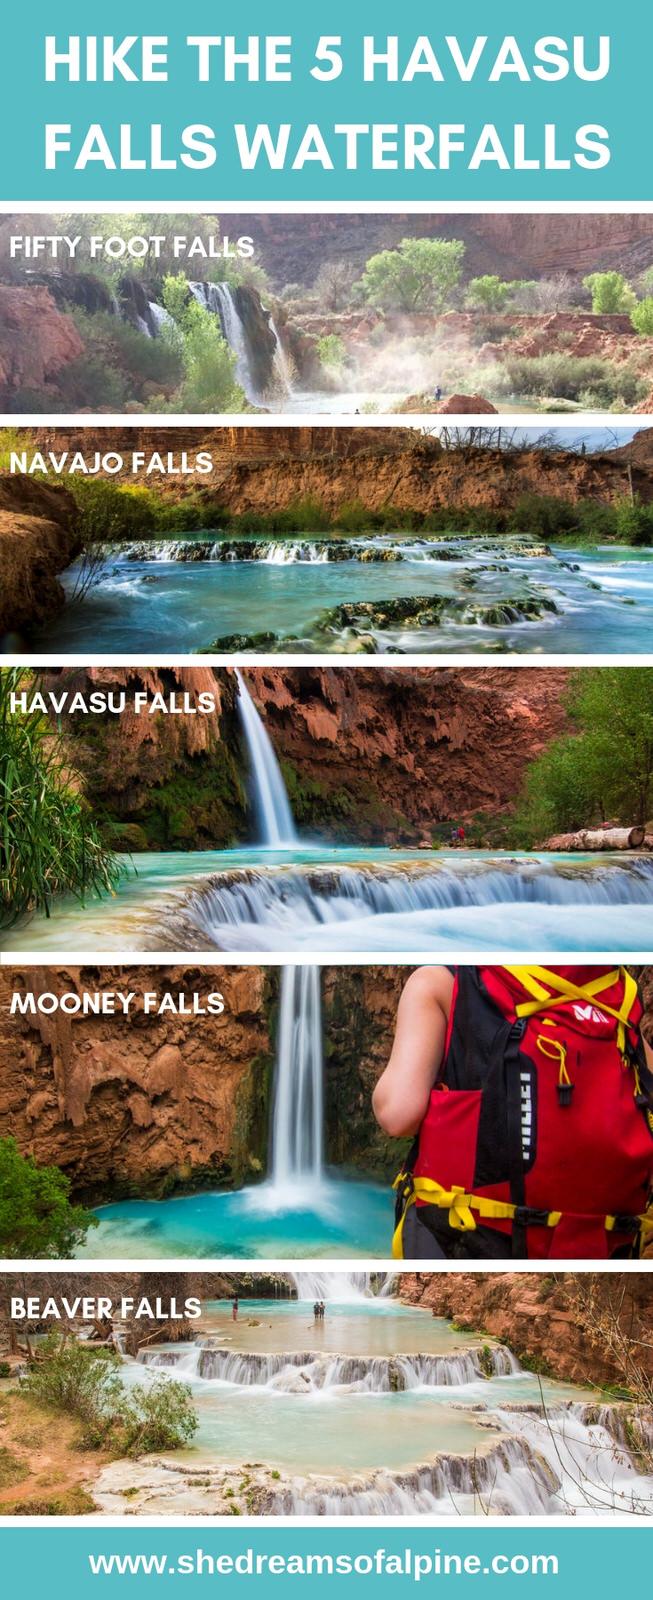 The Ultimate Guide to the Havasupai Falls Hike in Arizona